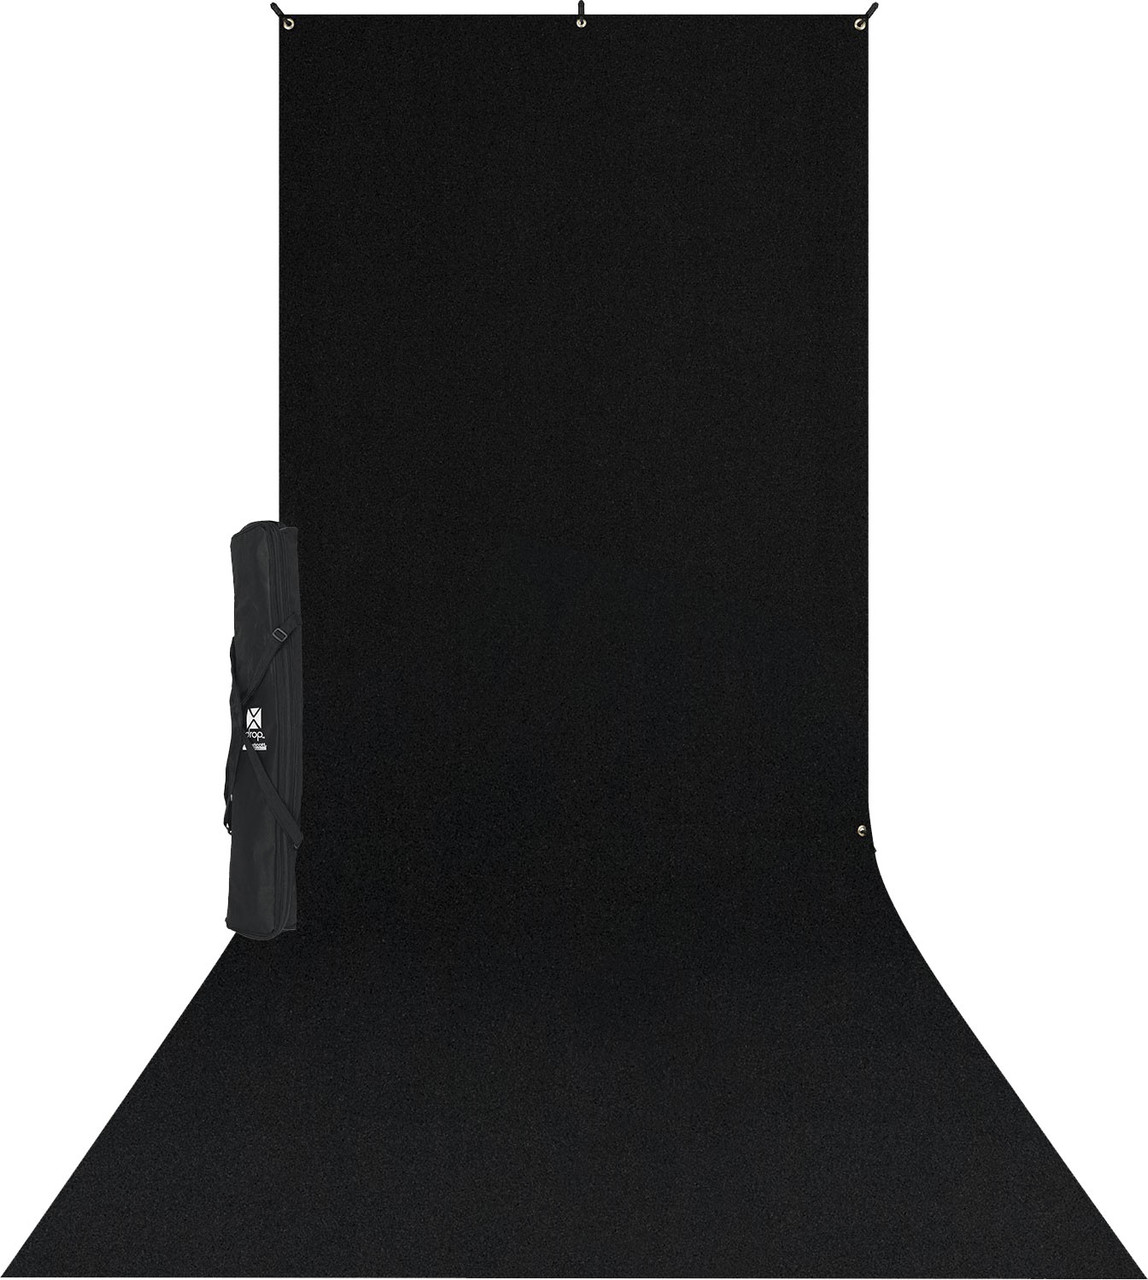 Westcott X-Drop Wrinkle-Resistant Backdrop Sweep Kit - 5' x 12' Black